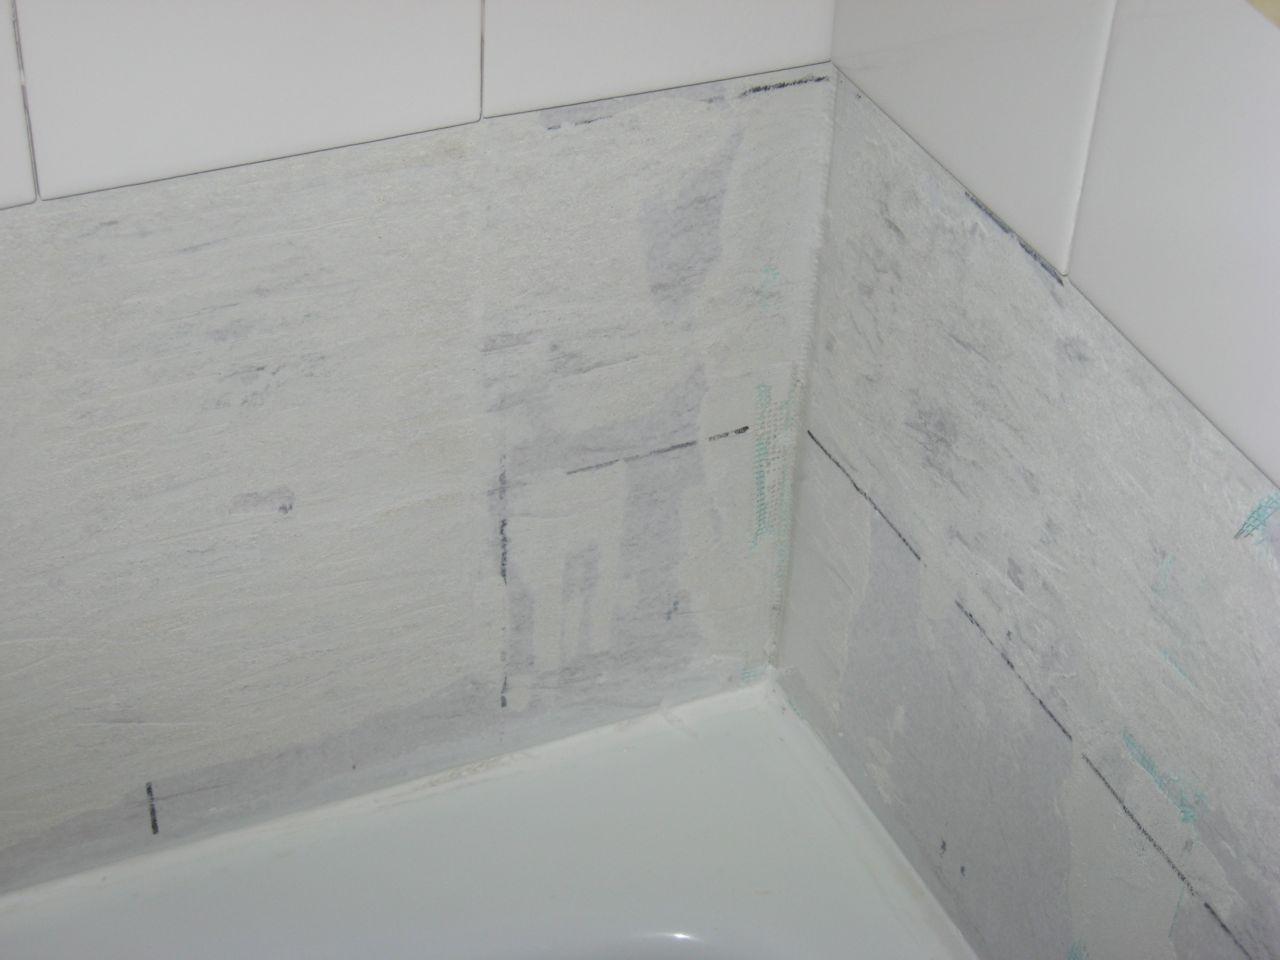 gap between shower tile walls and tub-img_1358.jpg